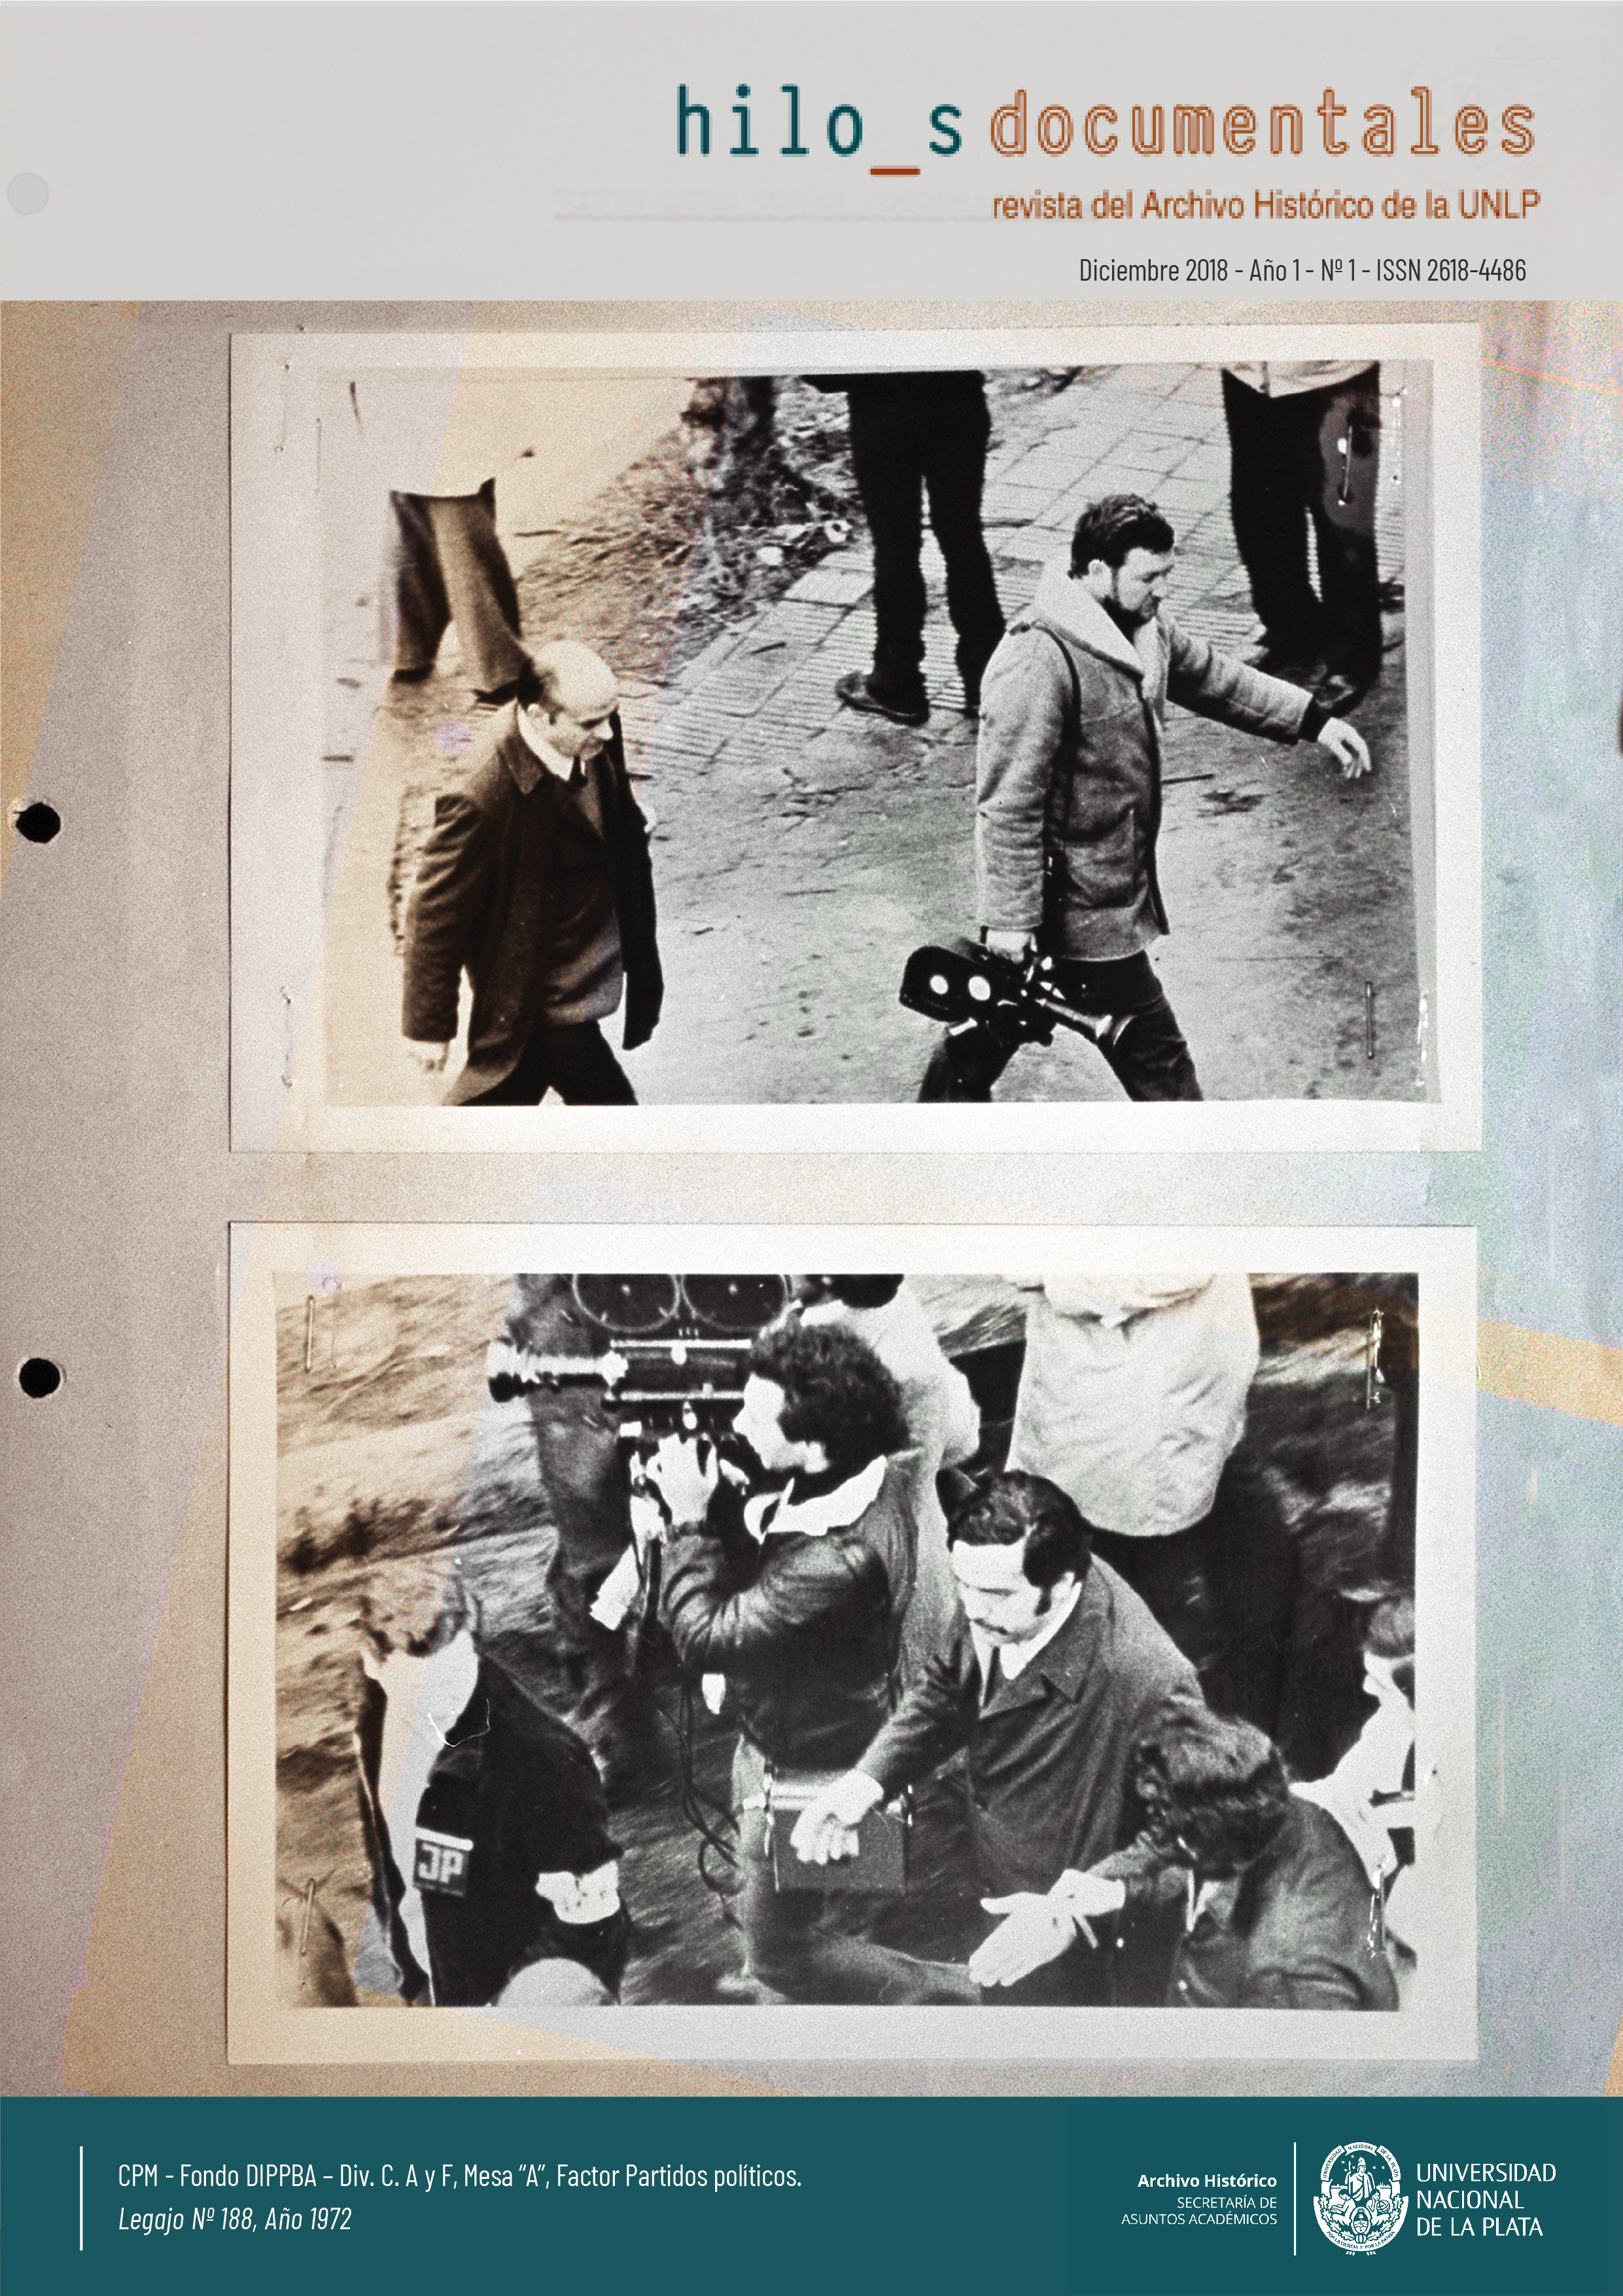 Hilos Documentales Archivo Histórico UNLP